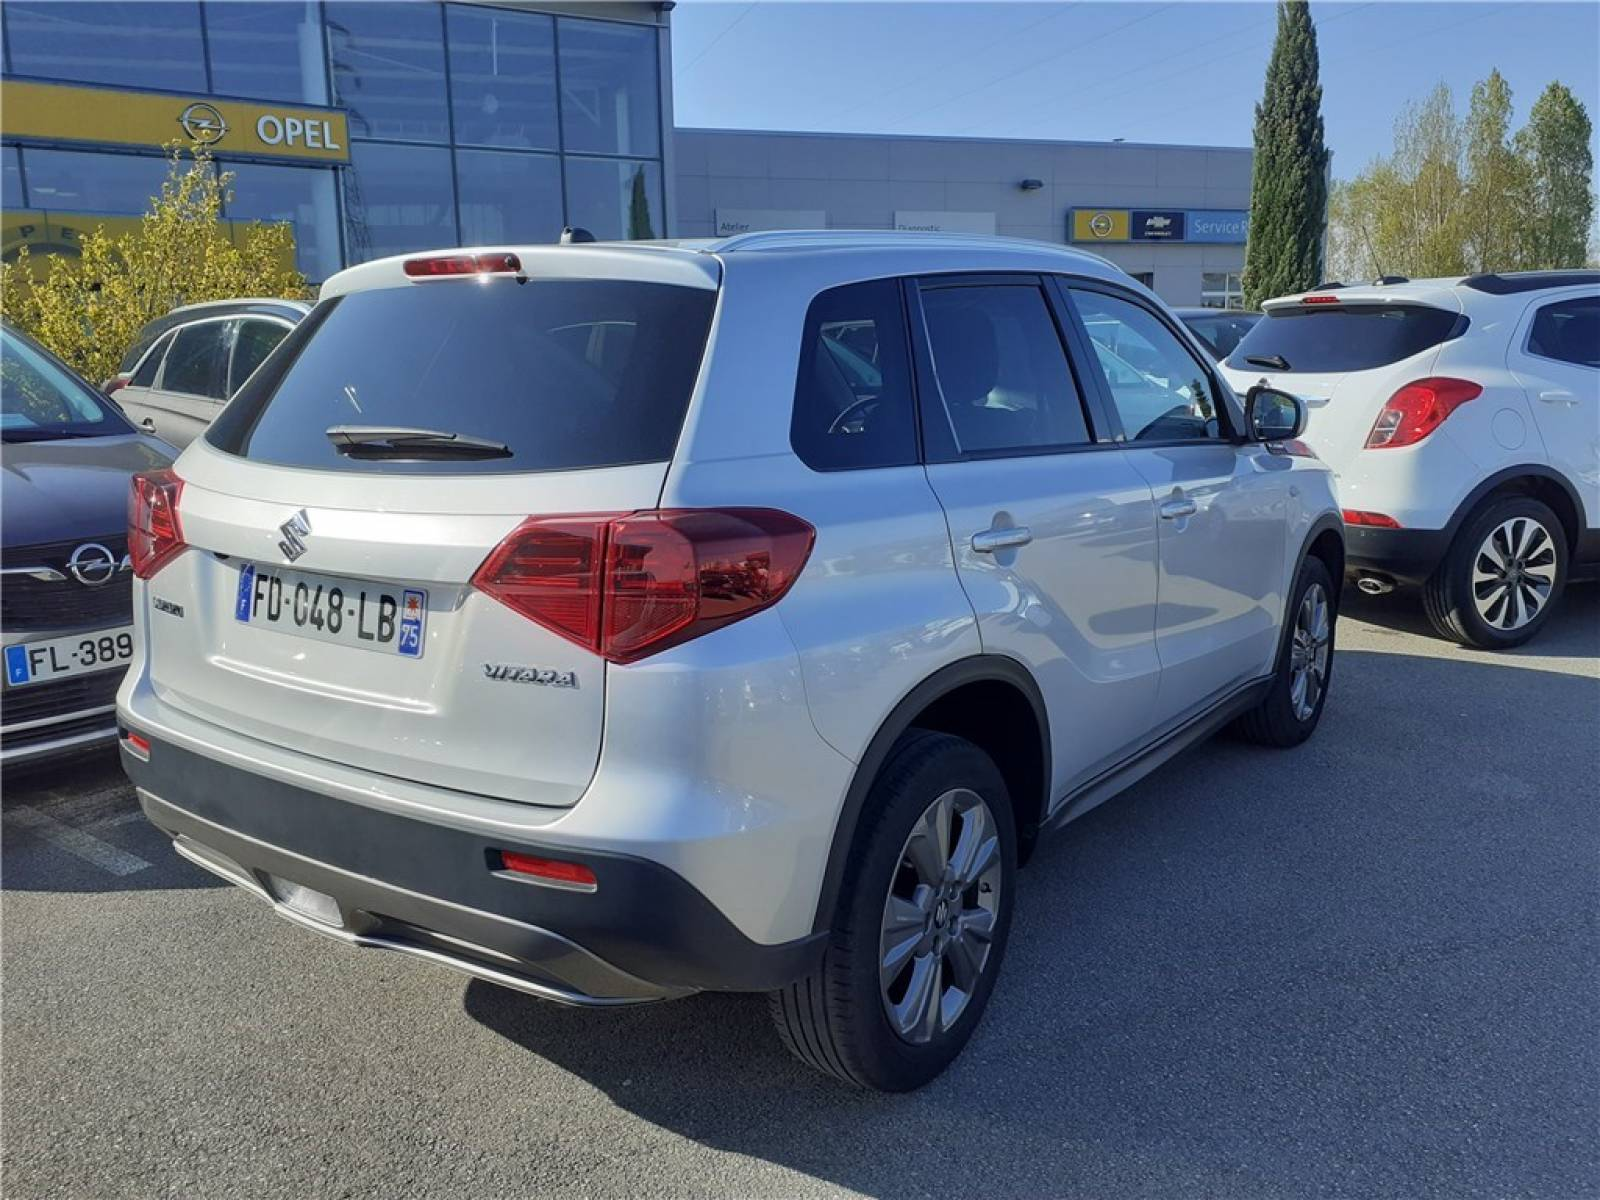 SUZUKI Vitara 1.0 Boosterjet - véhicule d'occasion - Groupe Guillet - Opel Magicauto - Chalon-sur-Saône - 71380 - Saint-Marcel - 7